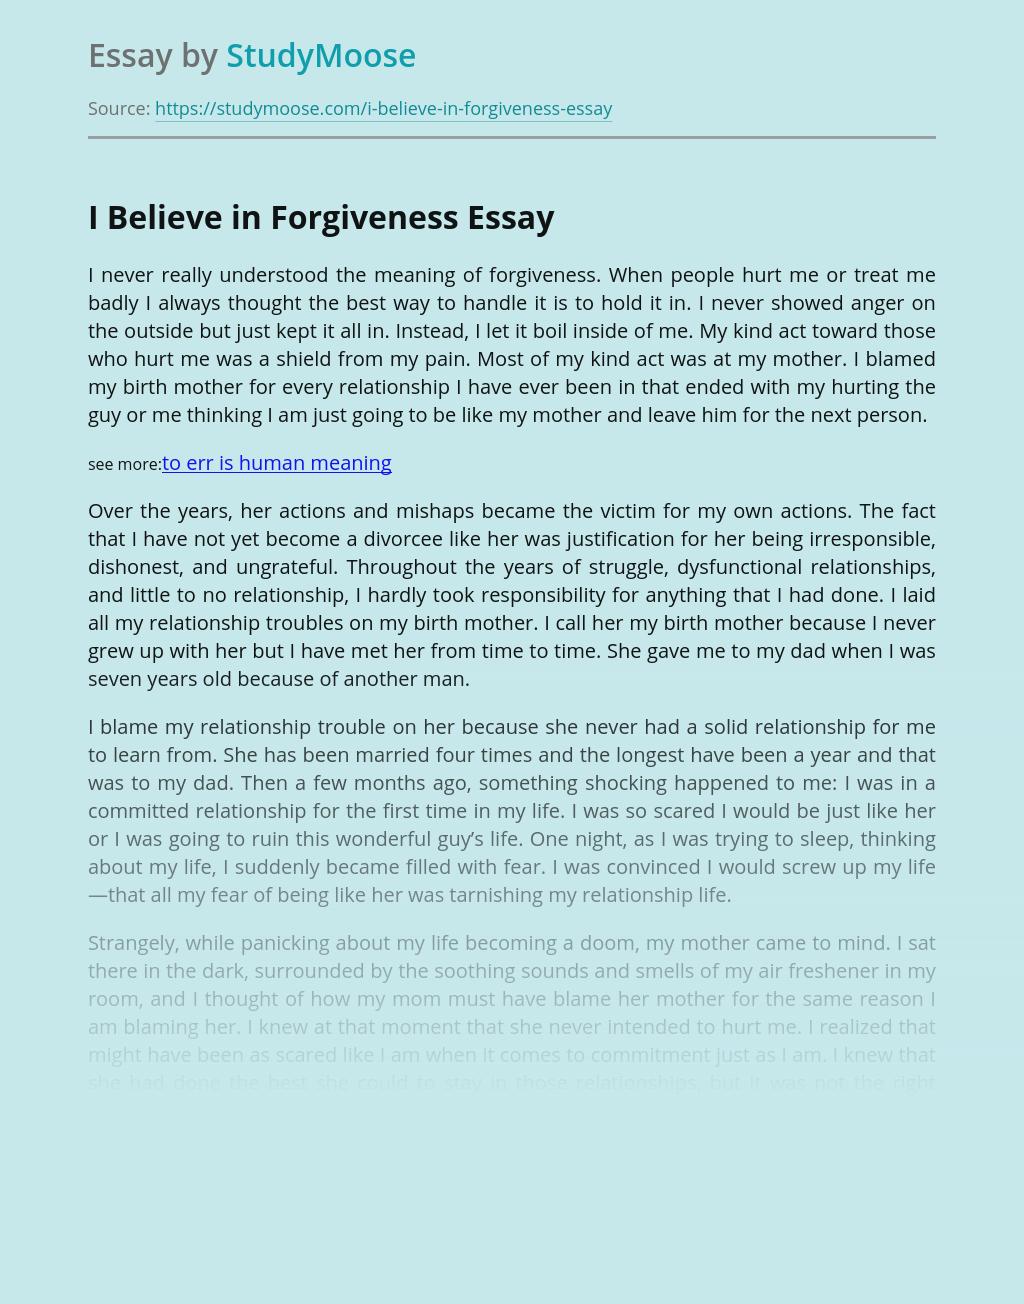 I Believe in Forgiveness